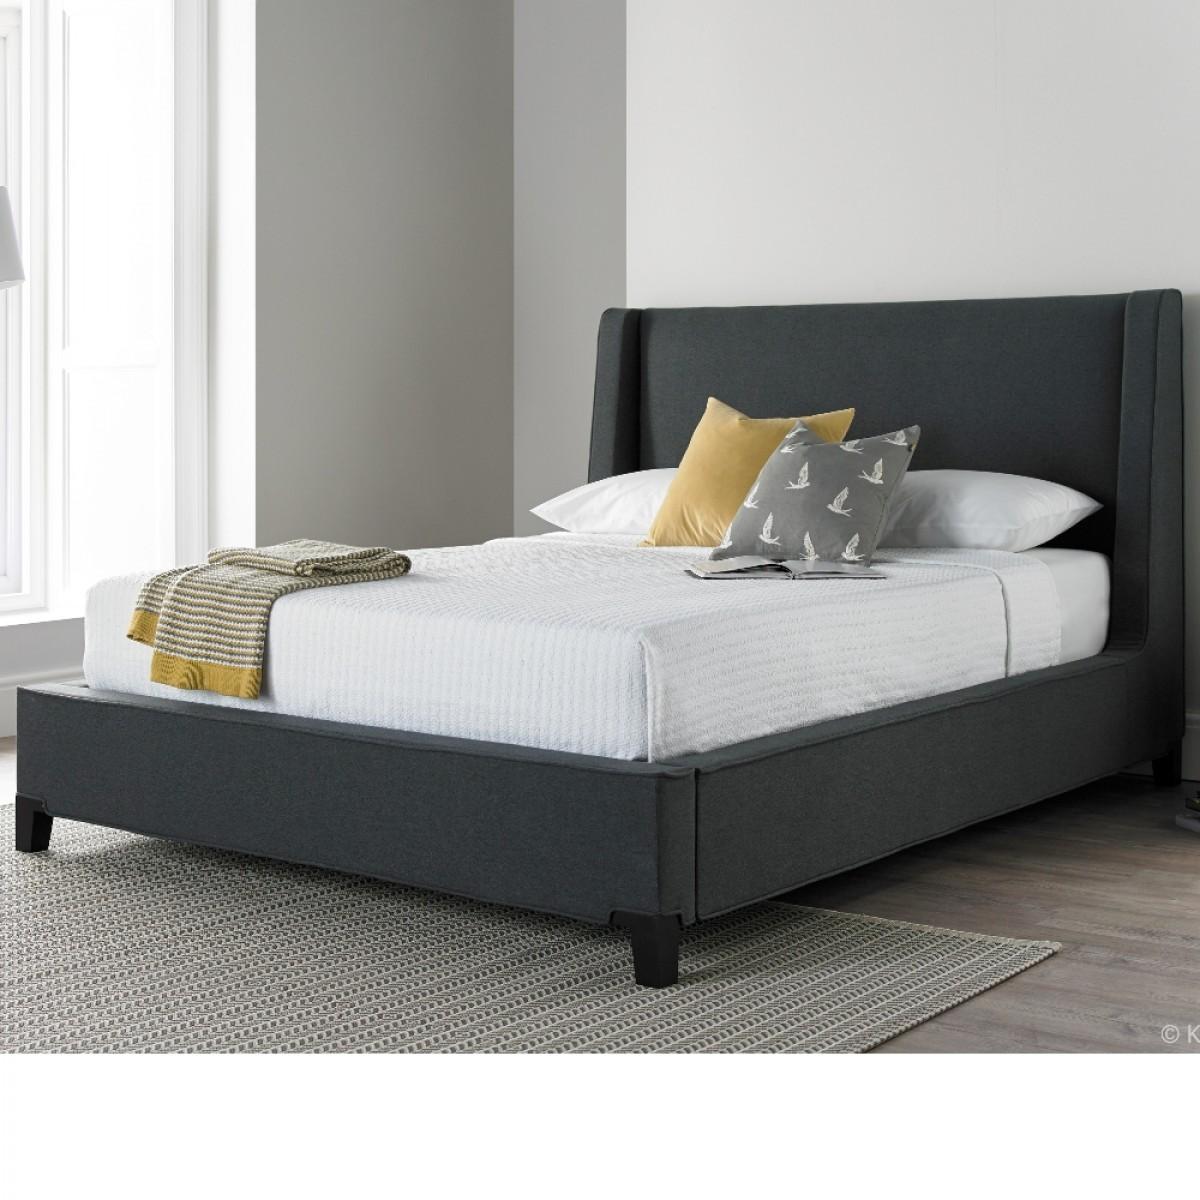 Lisa Berwick Grey Fabric Bed